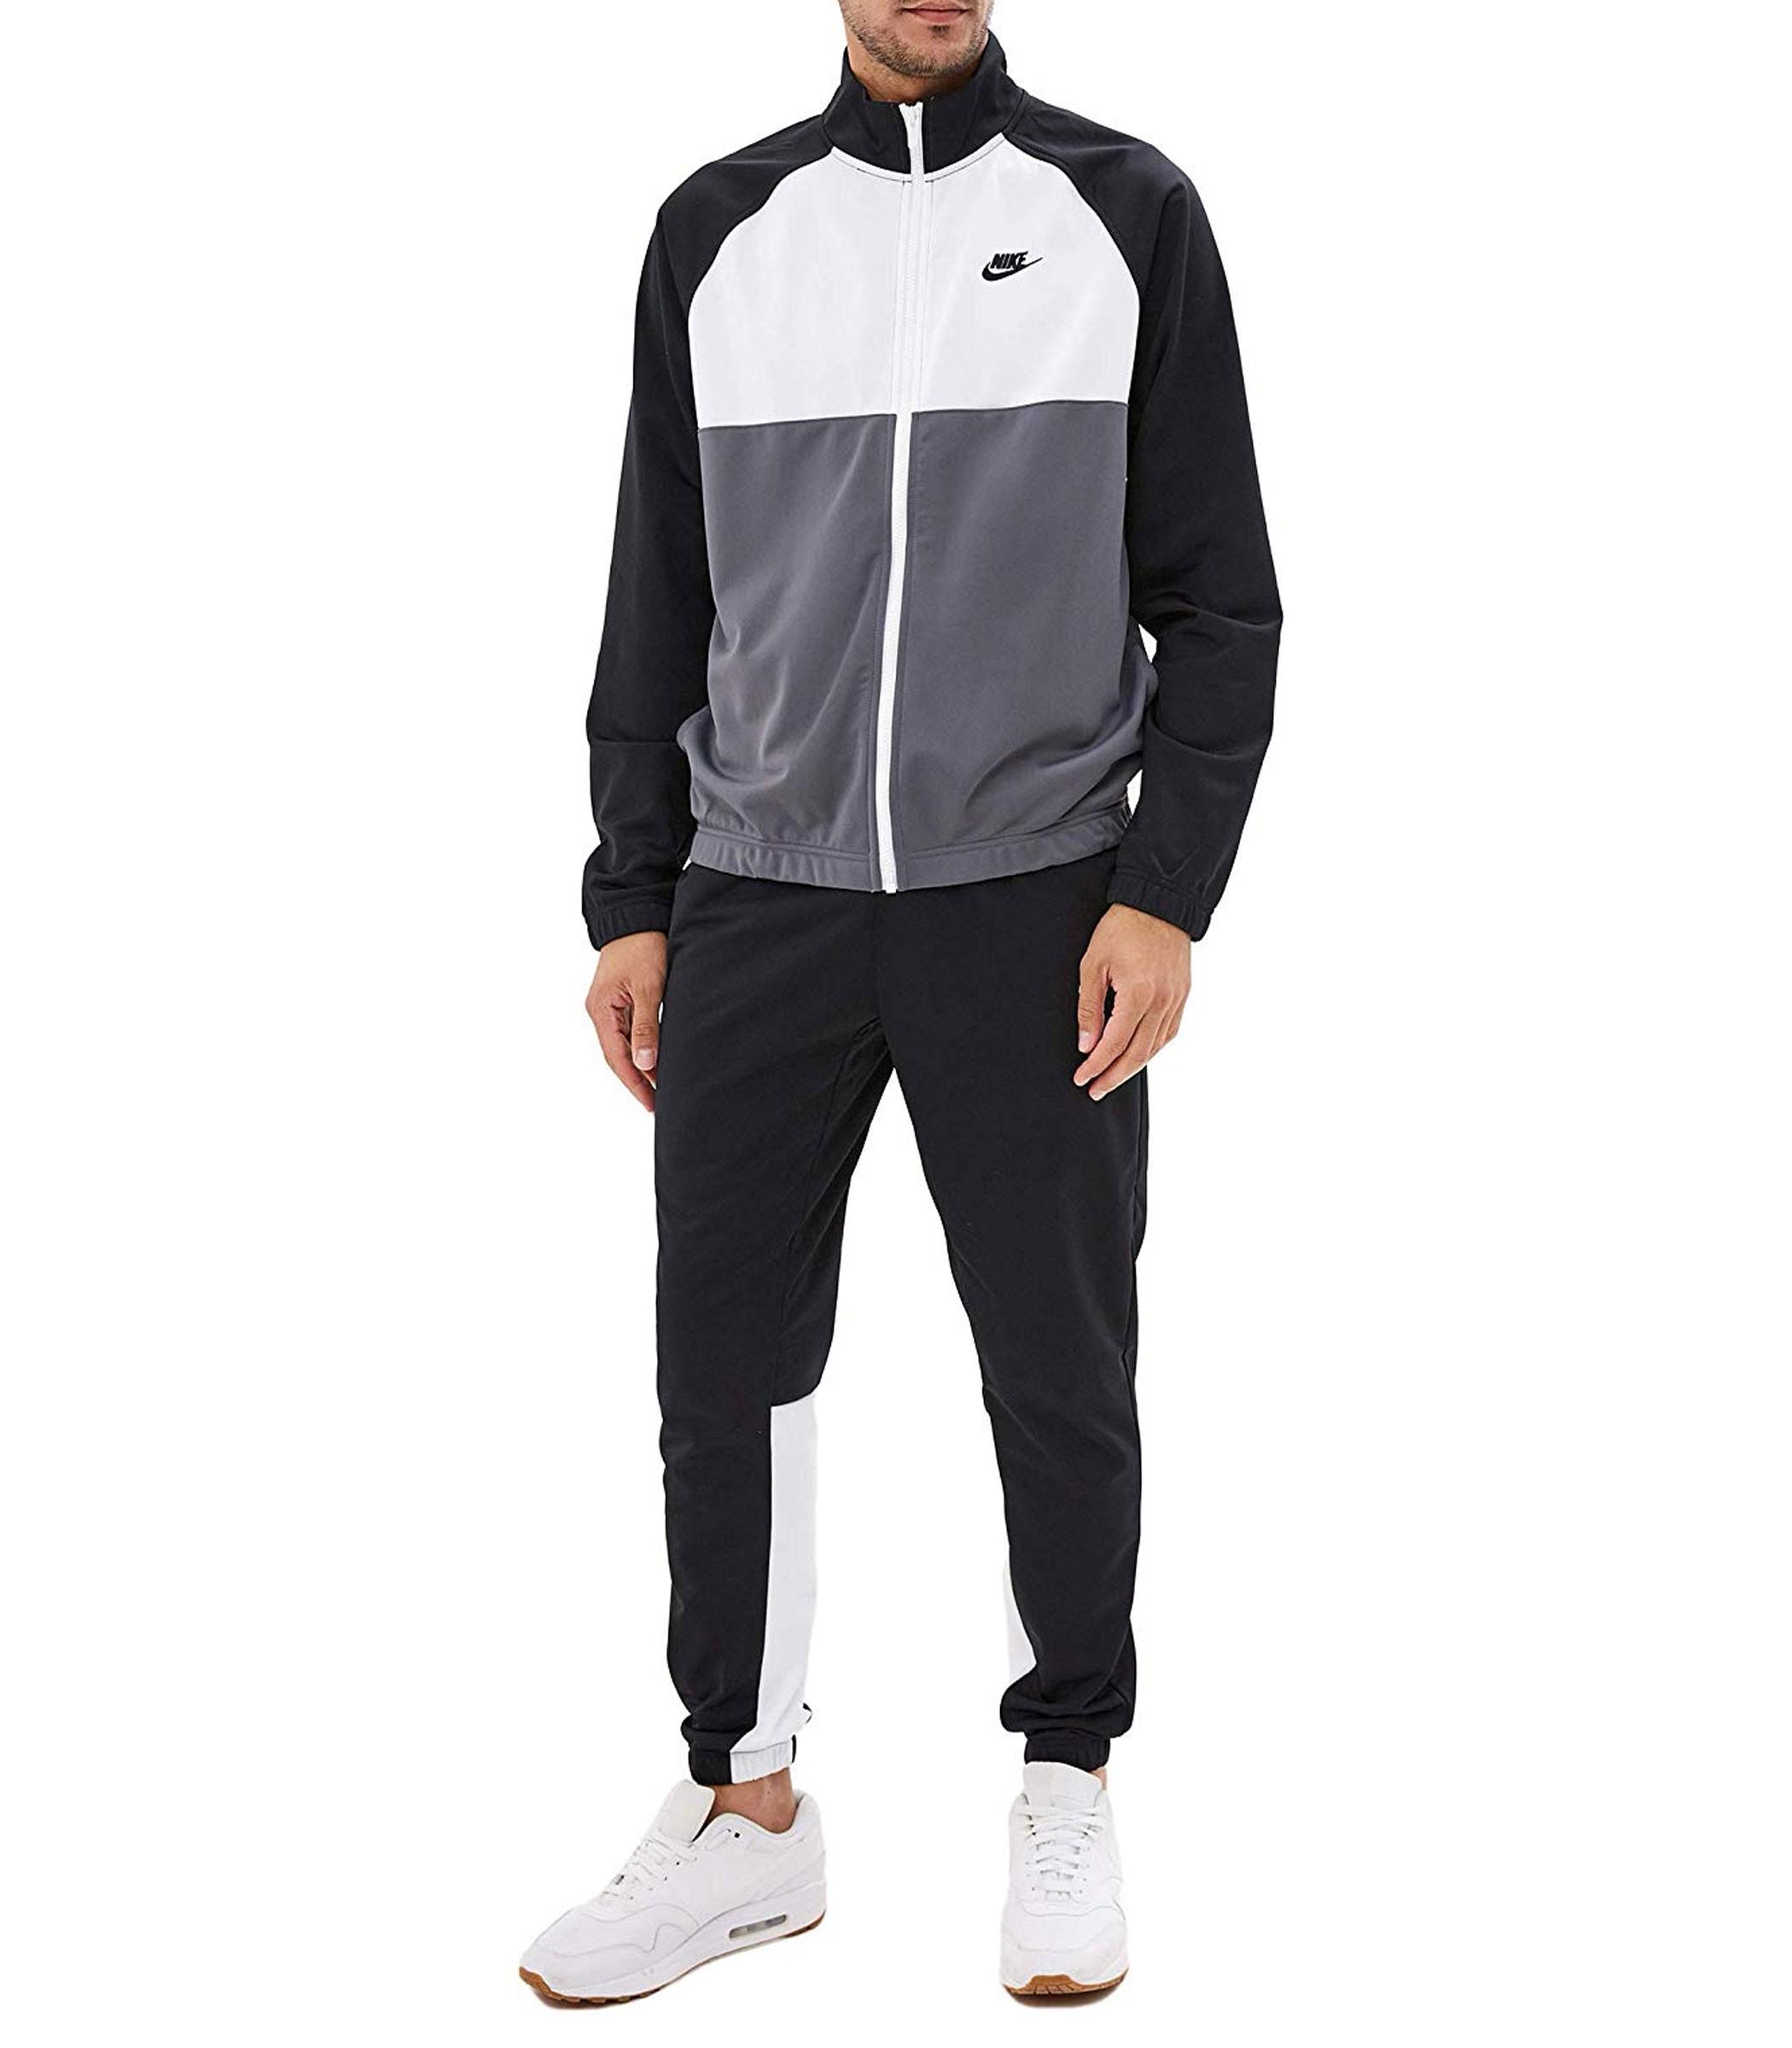 a6cea9effa Tuta Nike Sportswear felpa con zip pantaloni sportivi uomo BV3055-010